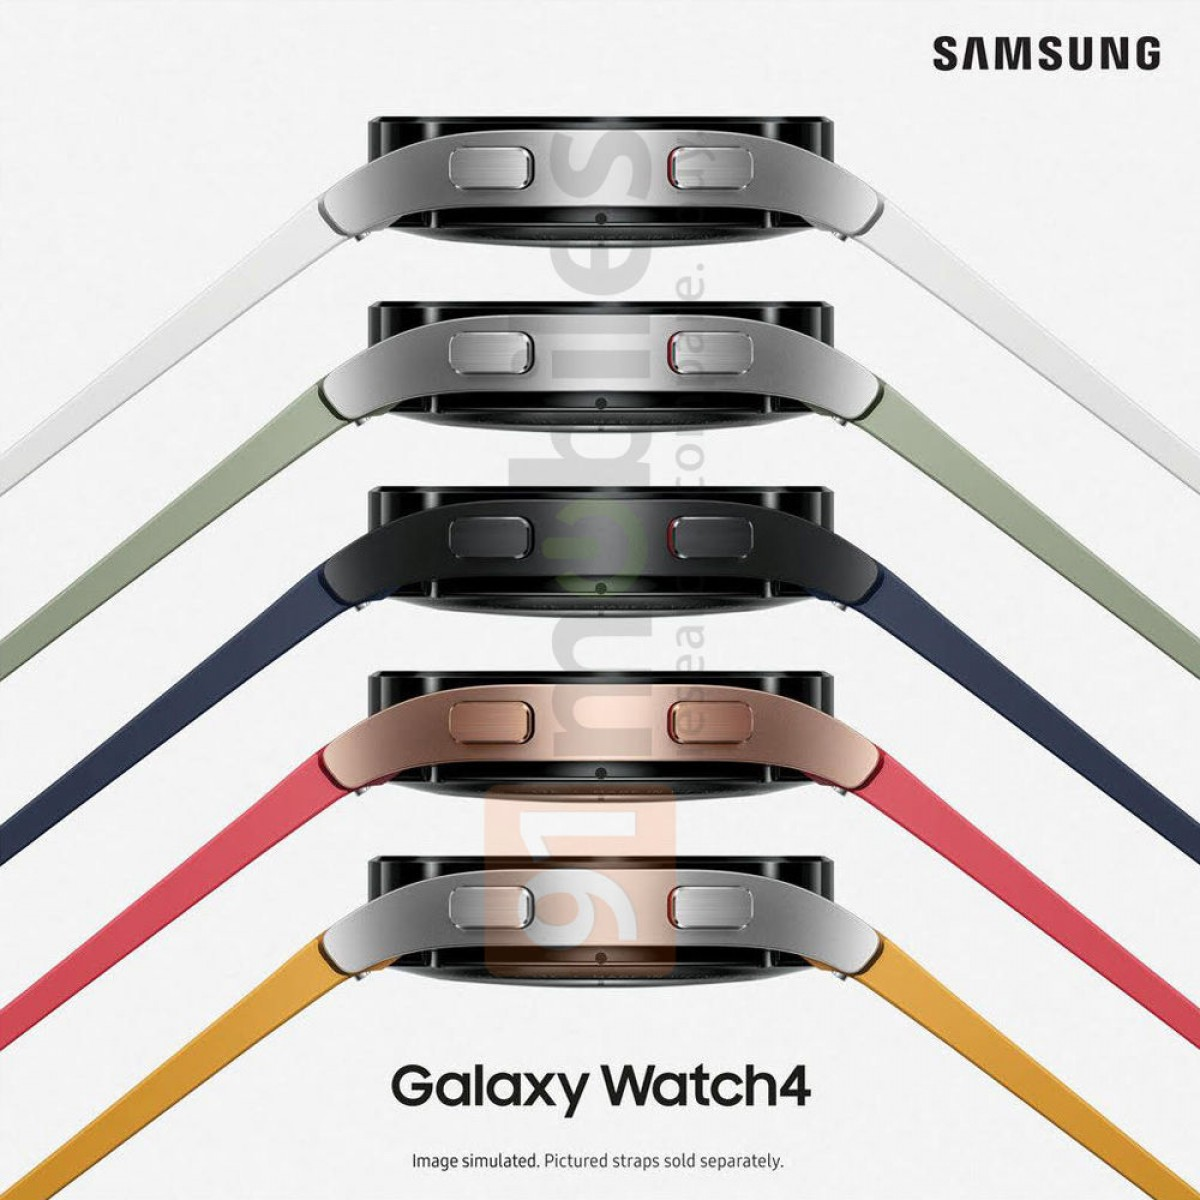 Официальная утечка данных Samsung Galaxy Watch4